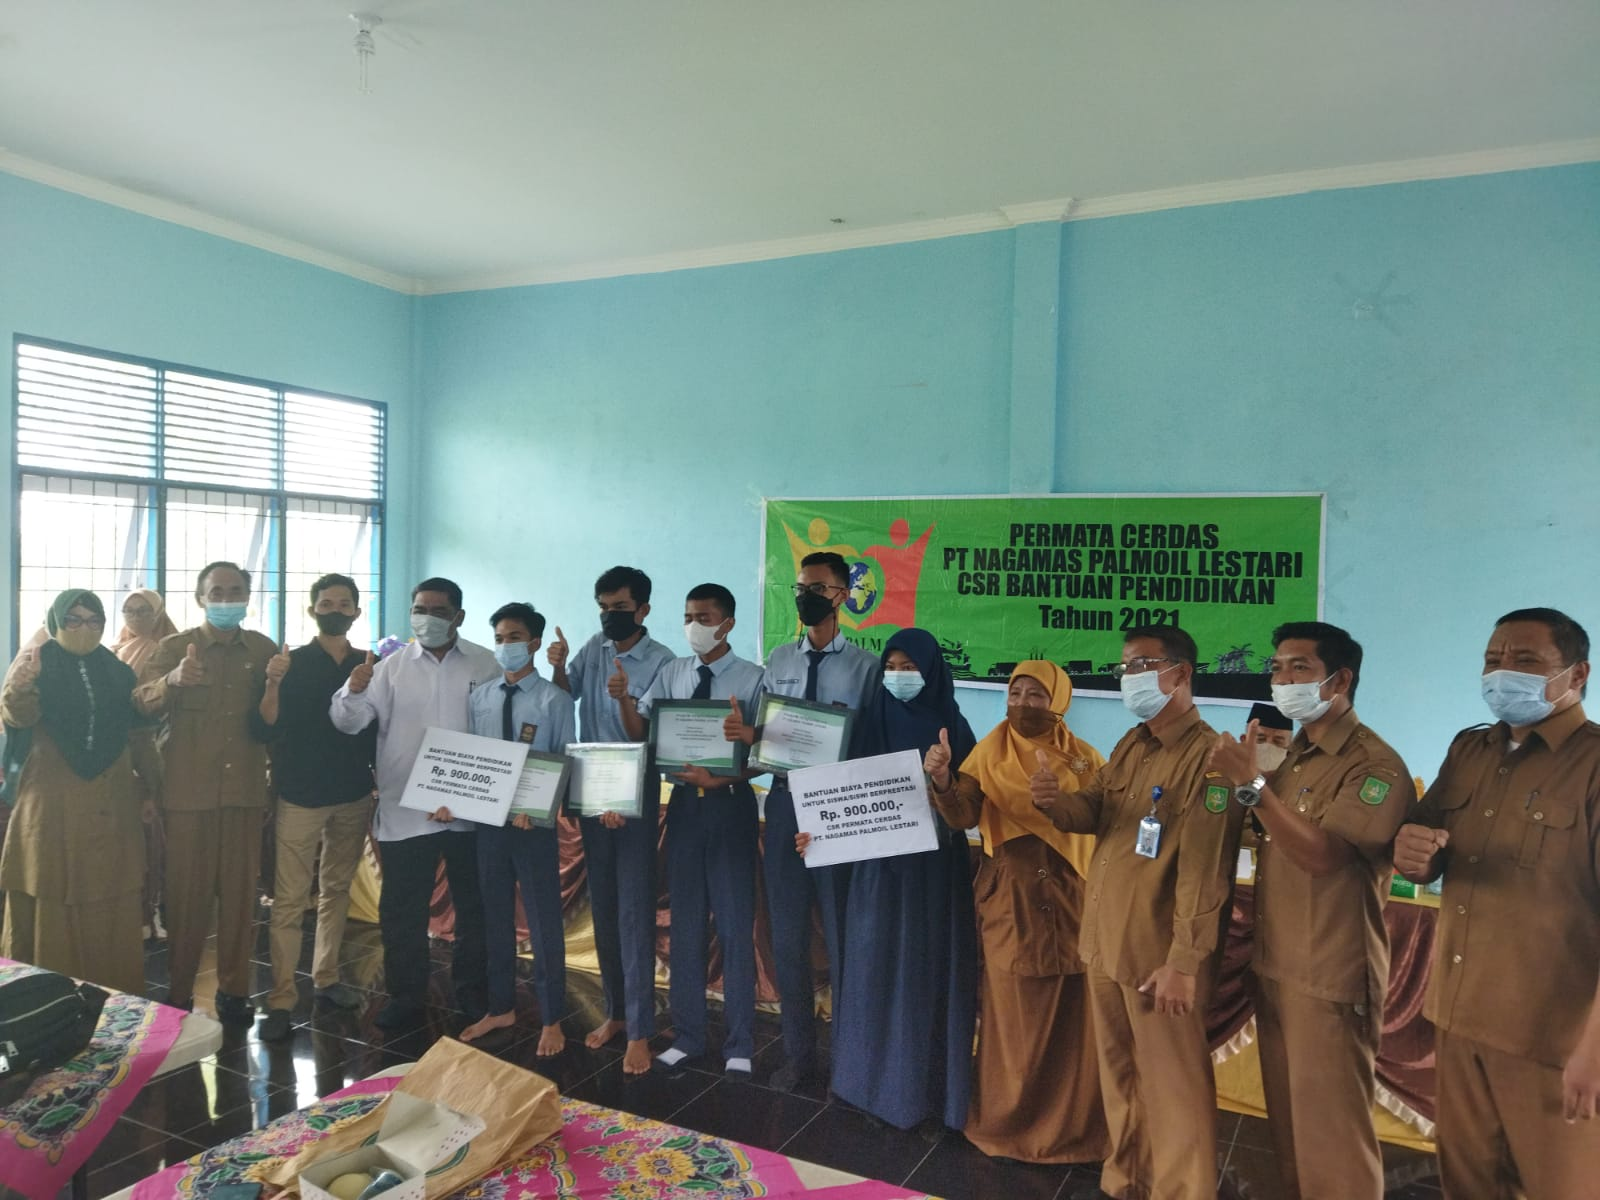 PT Naga Mas Palmoil Lestari Serahkan CSR Pendidikan untuk Siswa SMKN 5 dan SMKN 2 Dumai